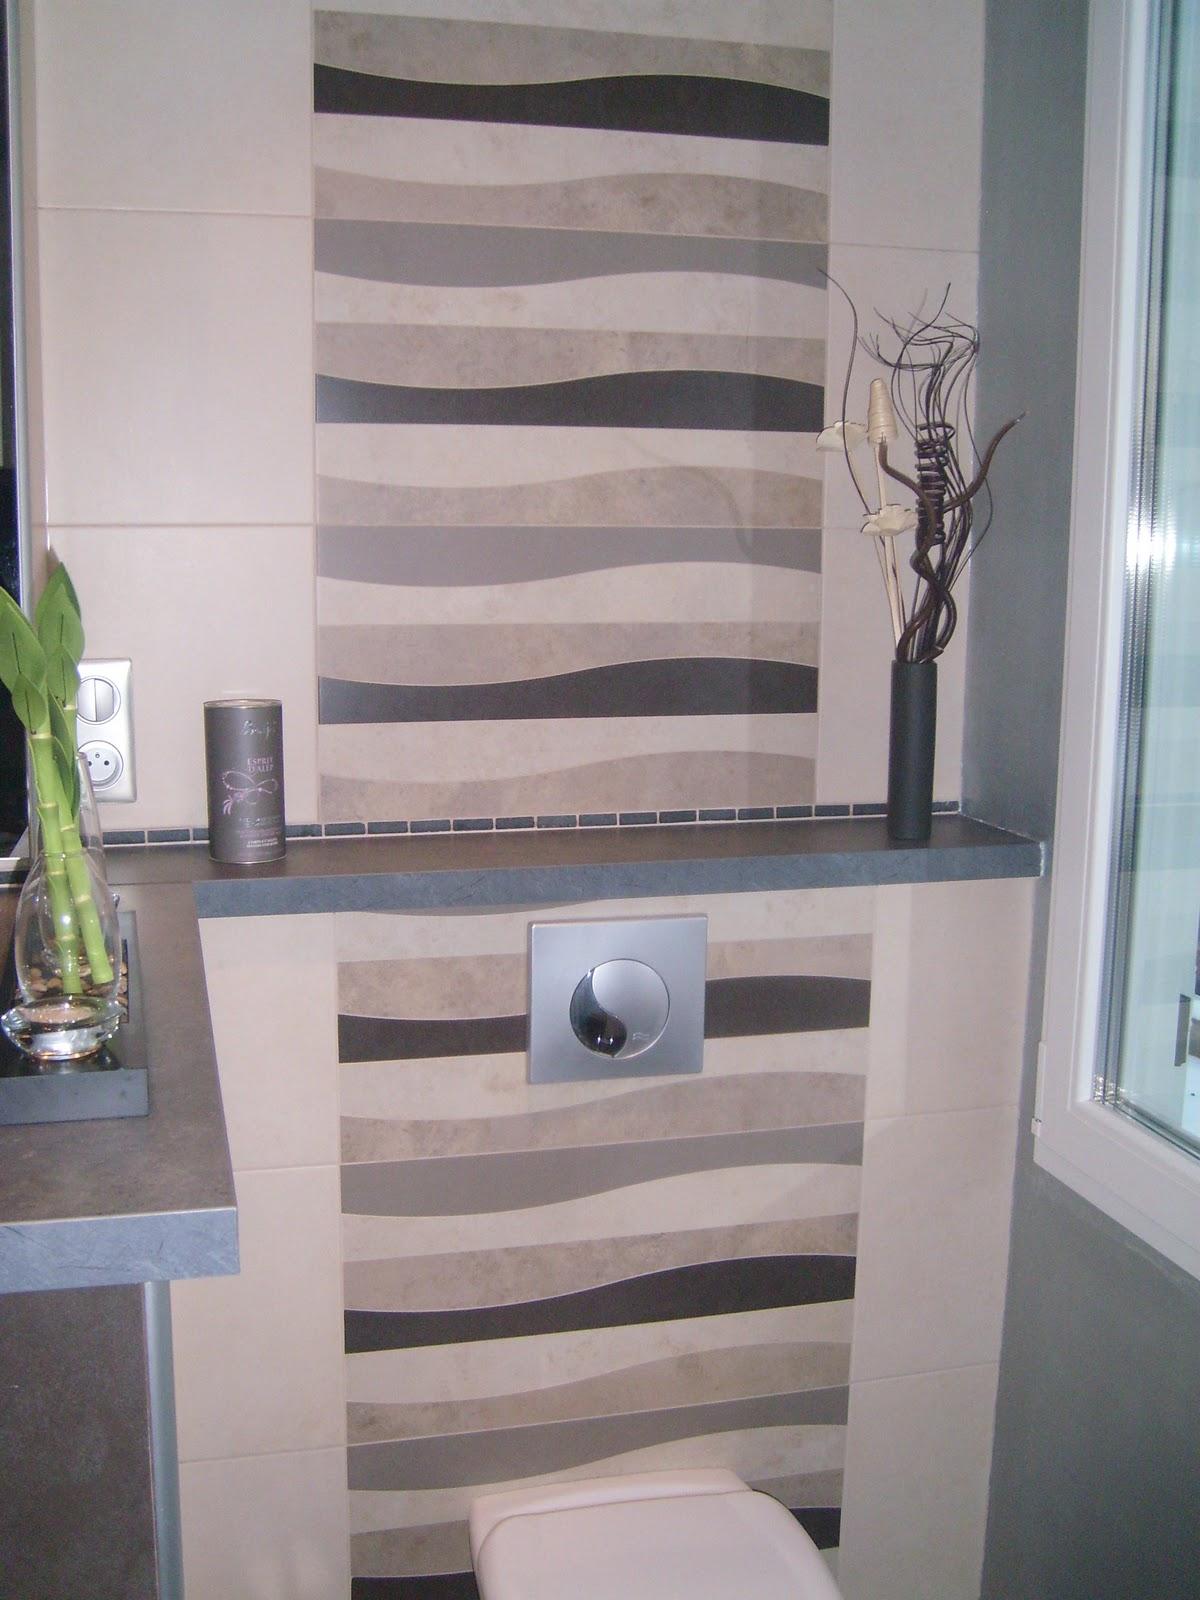 salle de bain beige et chocolat avec motifs vagues taupes beiges et chocolat - Salle De Bain Beige Chocolat